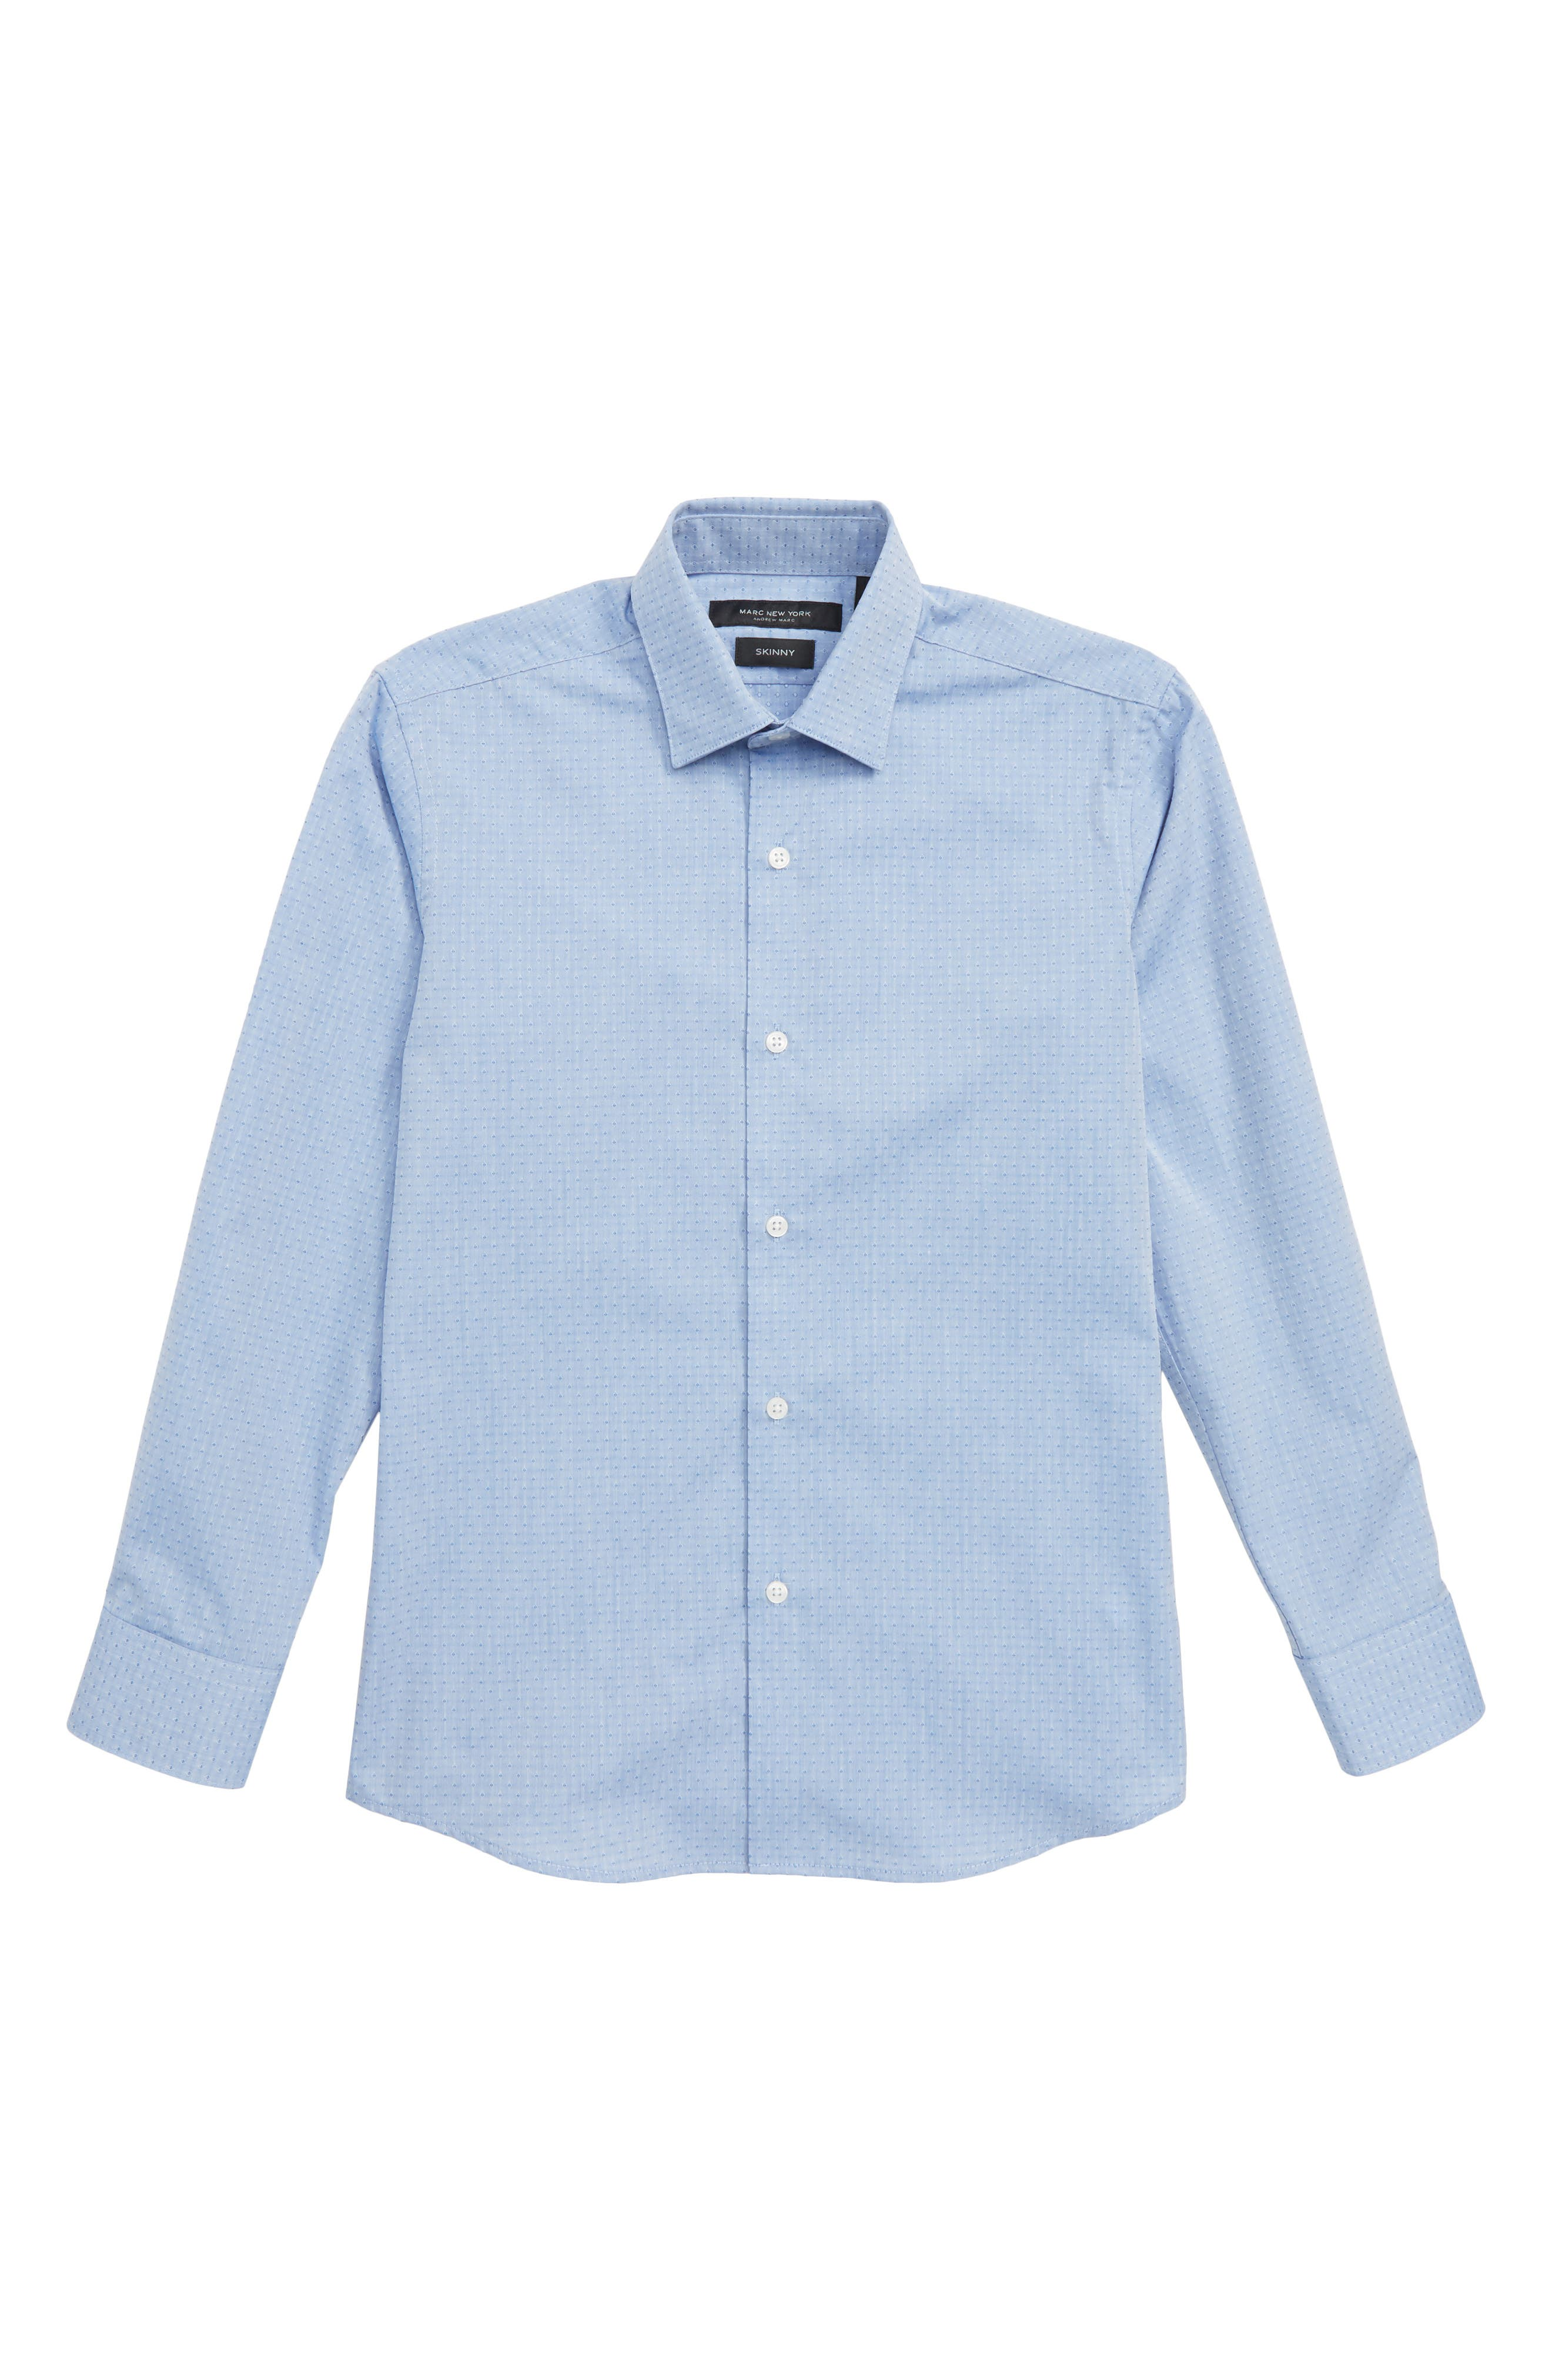 Diamond Print Dress Shirt,                         Main,                         color, Blue